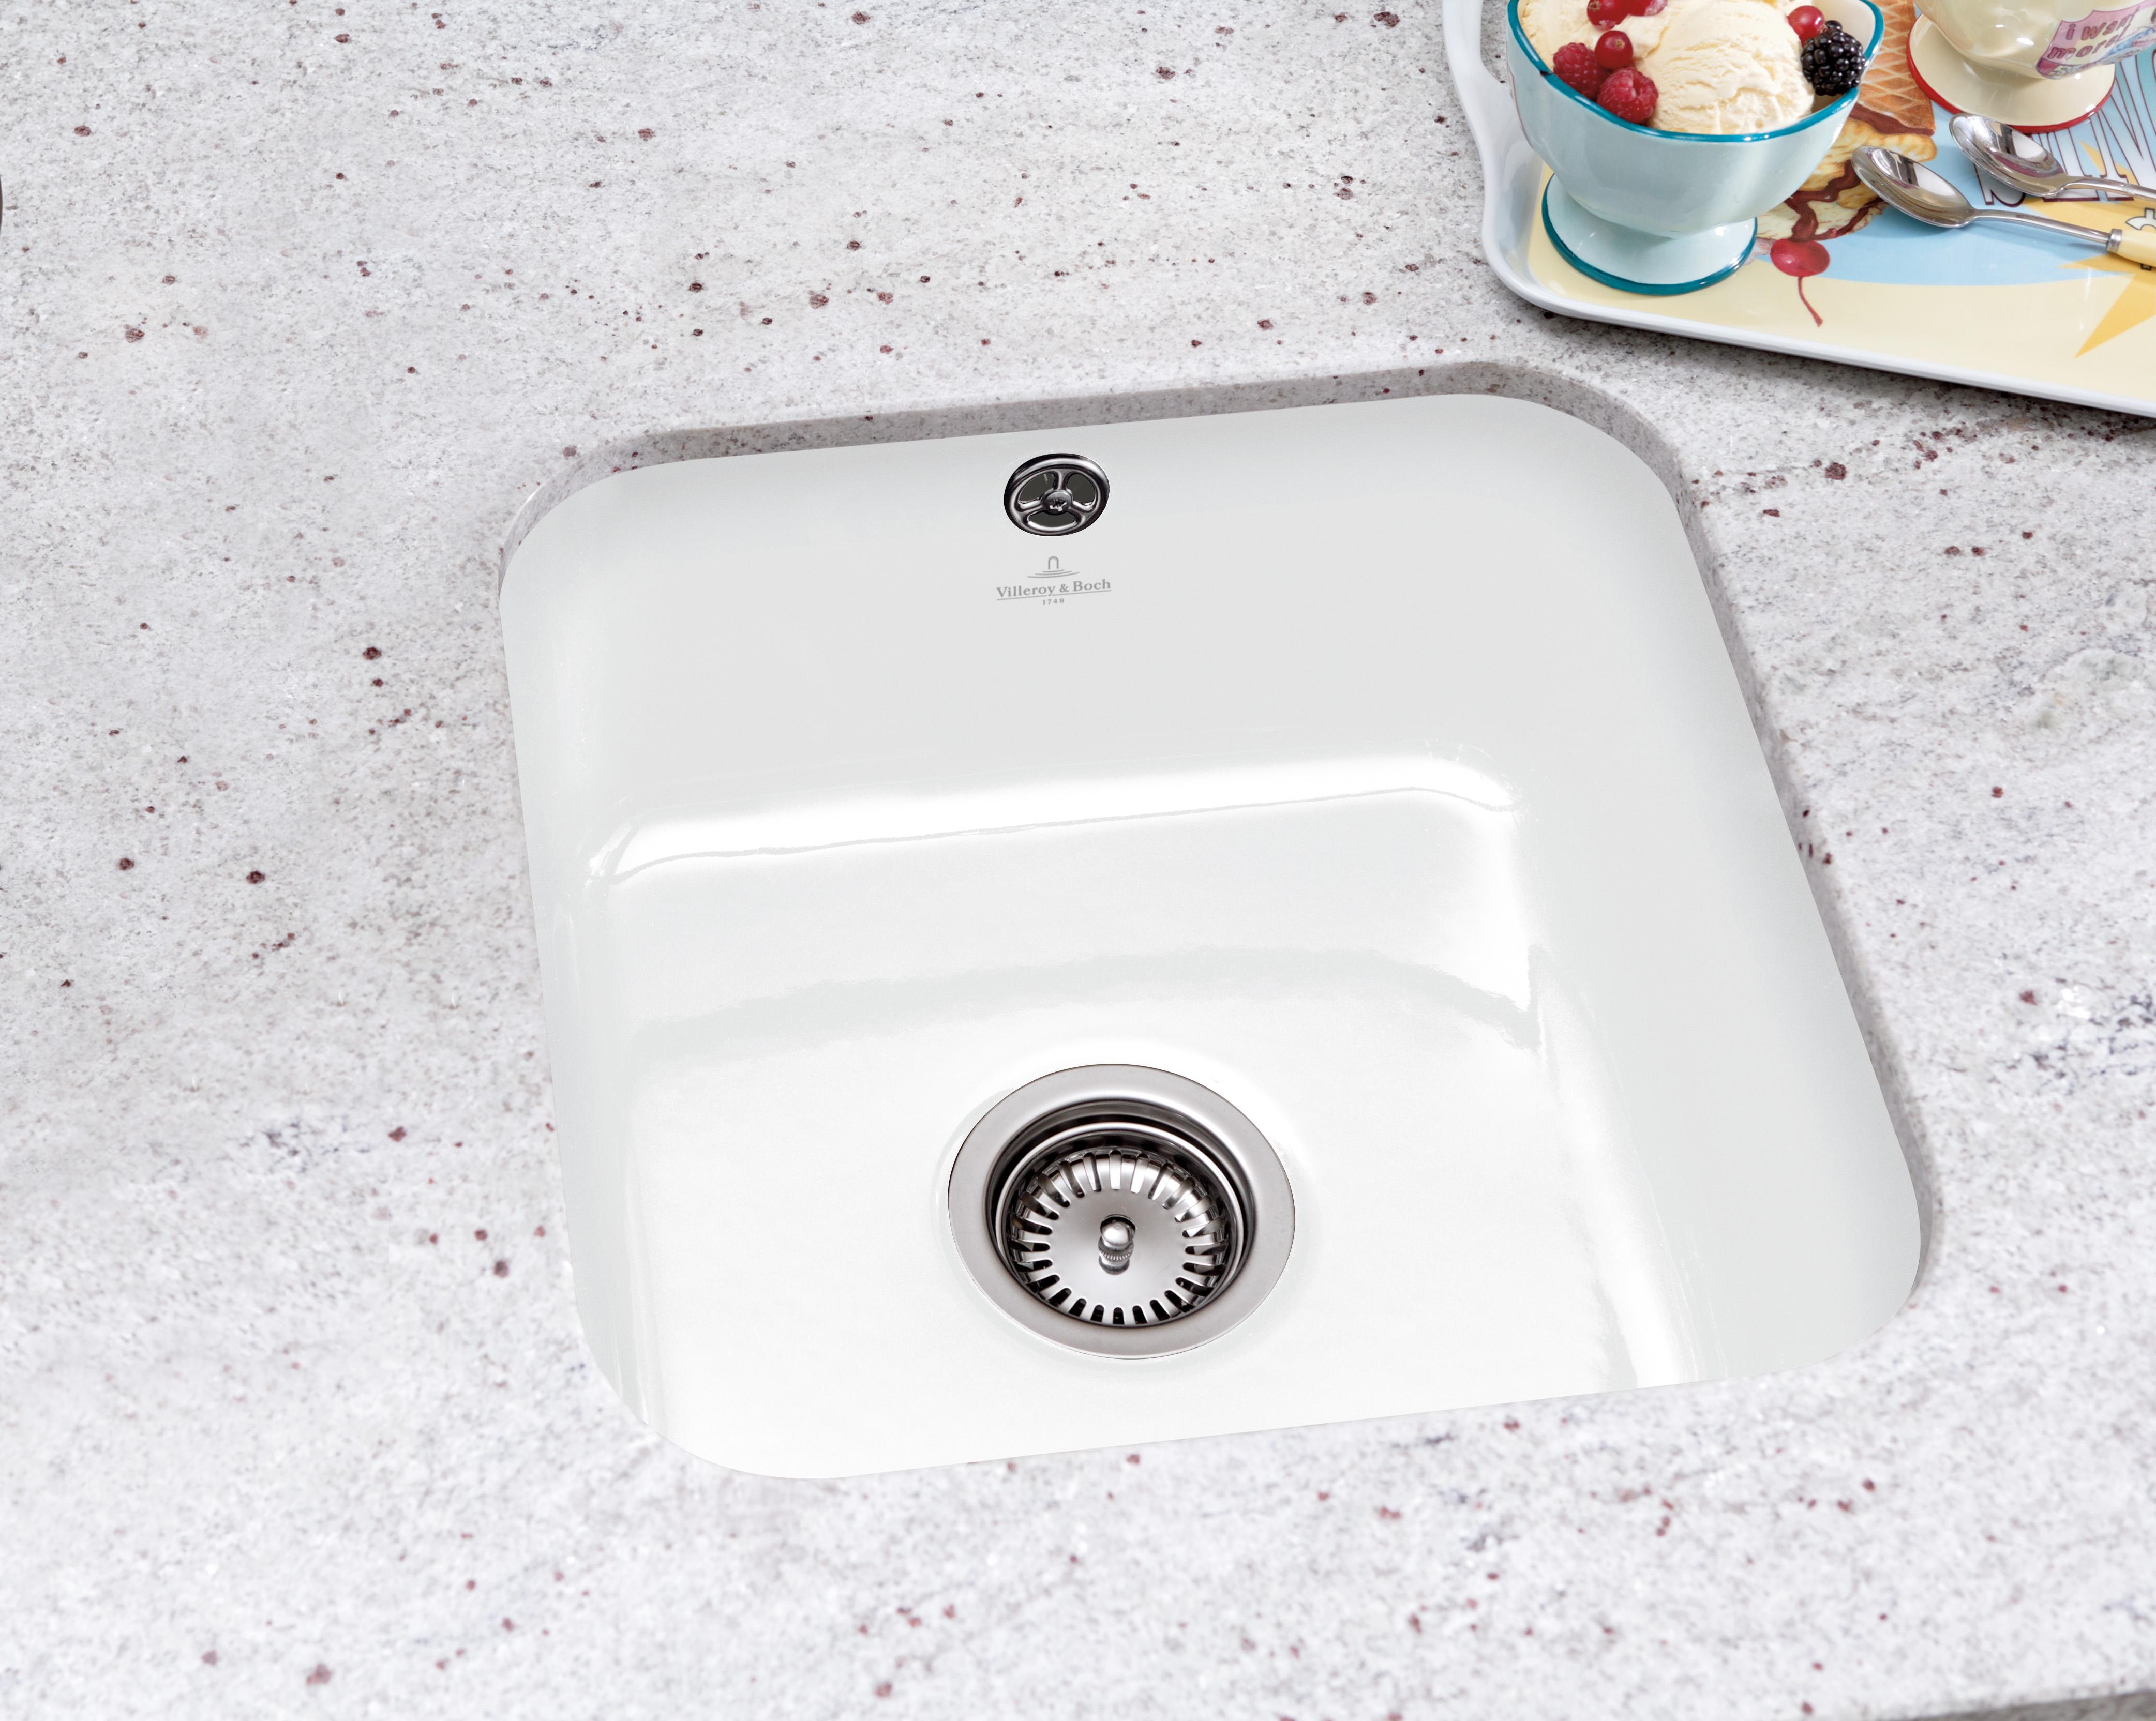 Cisterna Undercounter sinks